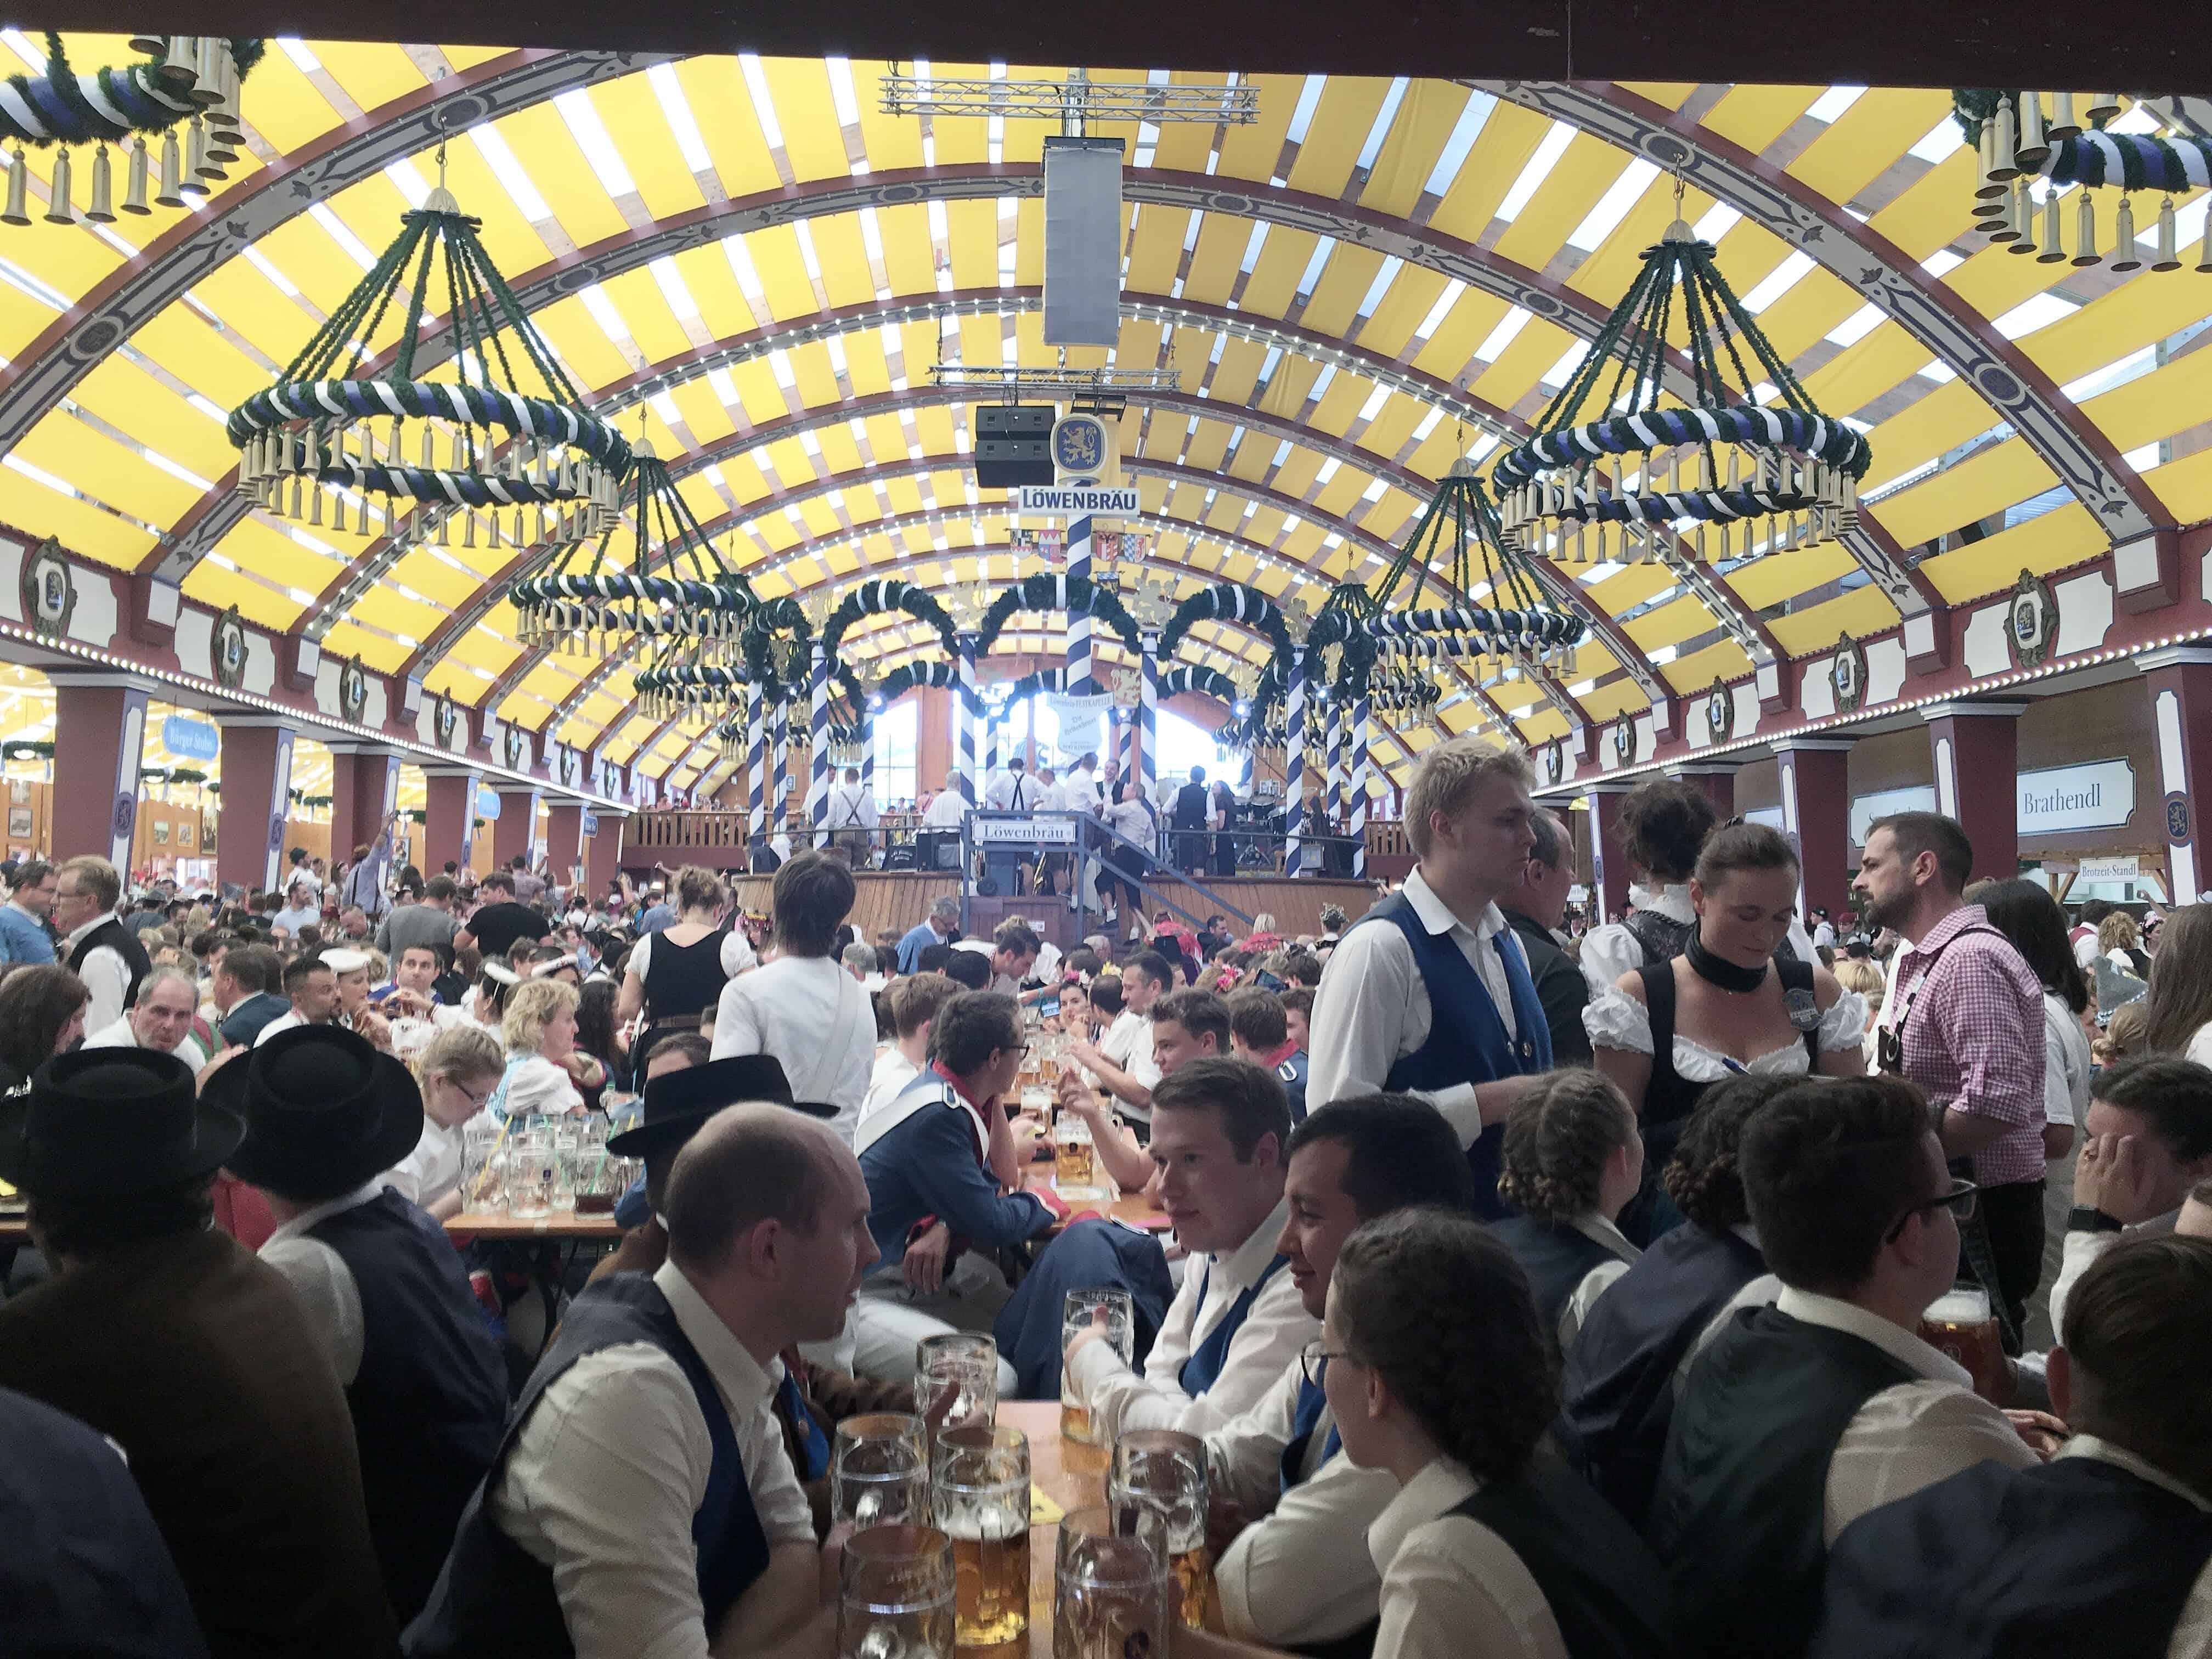 Löwenbräu Beer Hall at Oktoberfest in Munich, Germany